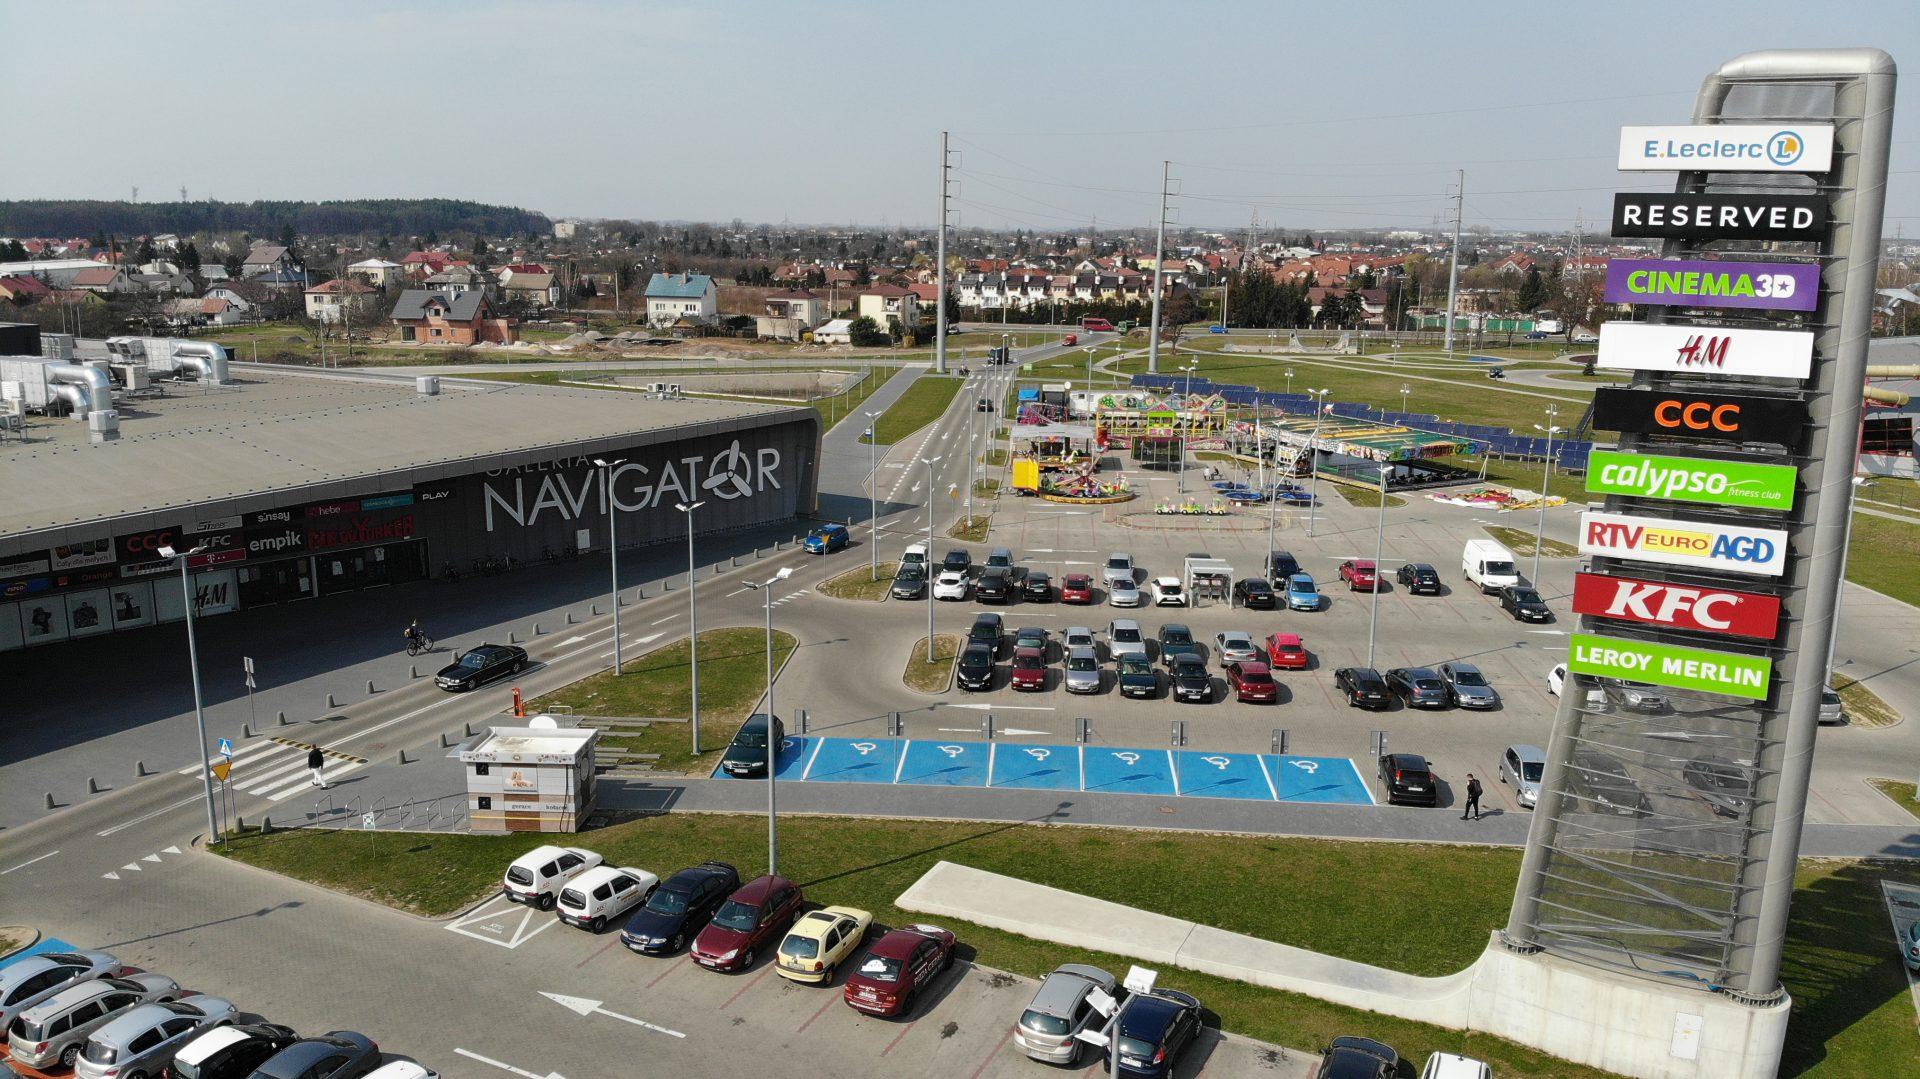 Wiosenne trendy w Galerii Navigator